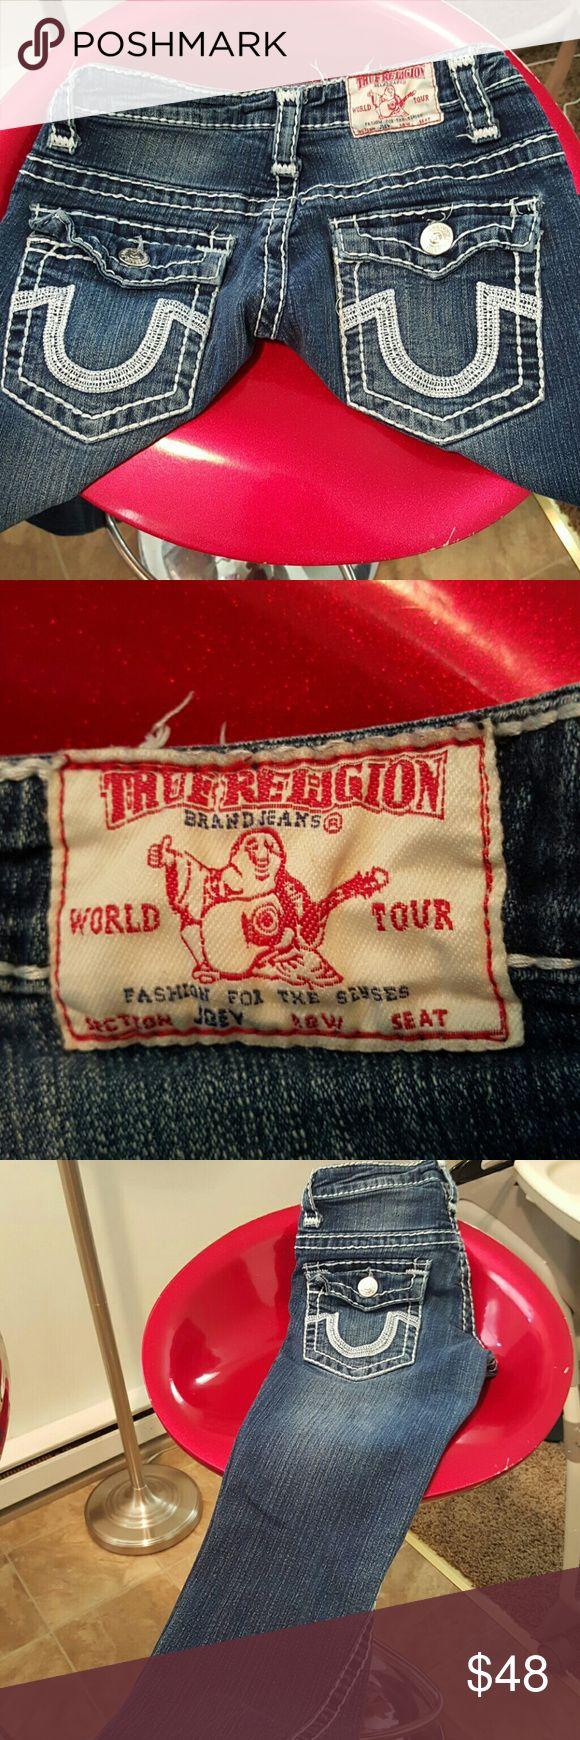 True Religon Joey women's jeans 26/32 Size 26 length 32 excellent condition True Religion Pants Boot Cut & Flare